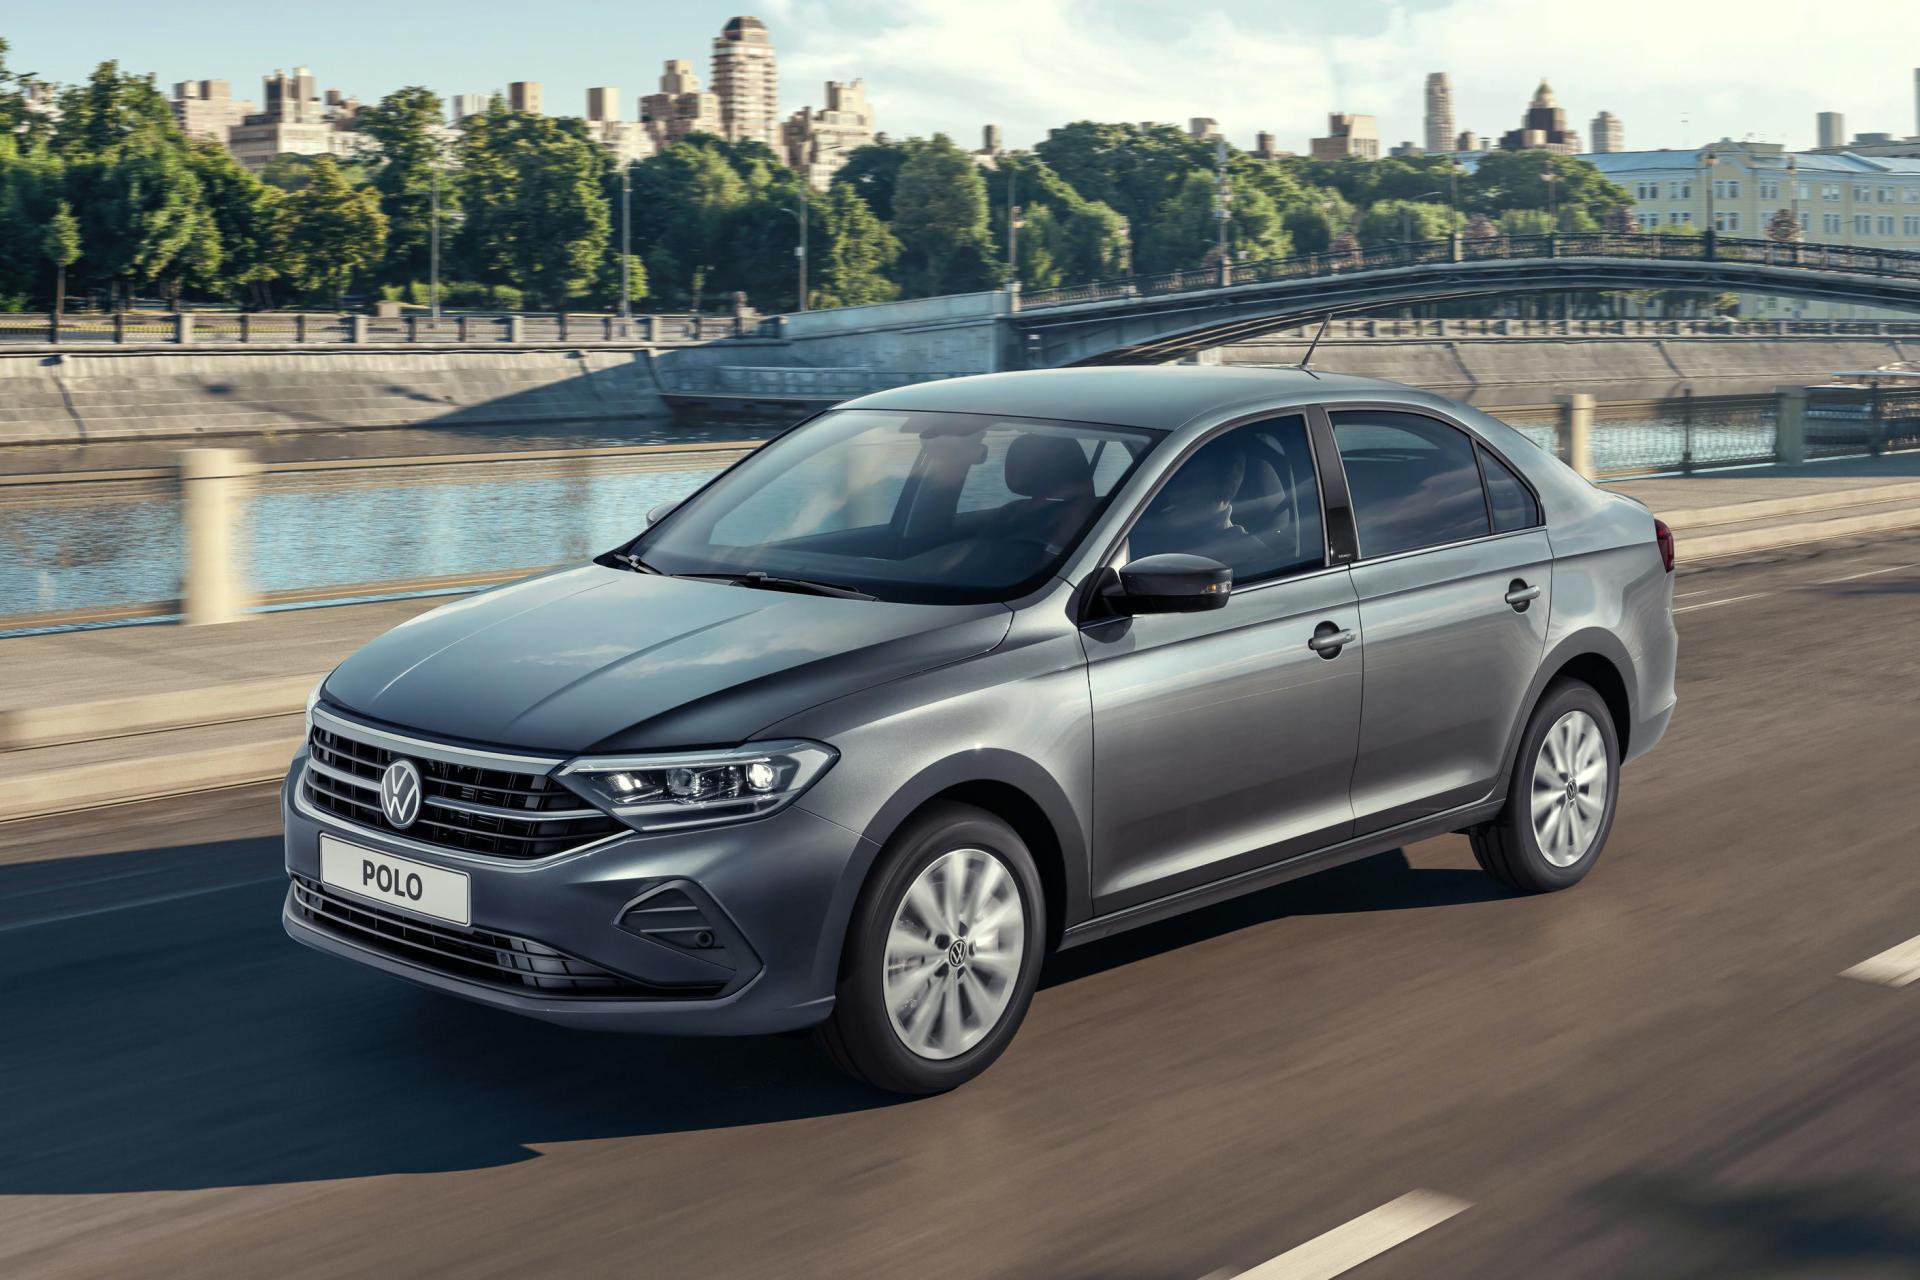 2021 Volkswagen Vento Notchback Sedan Revealed In Russia India Car Might Get Similar Design Zigwheels